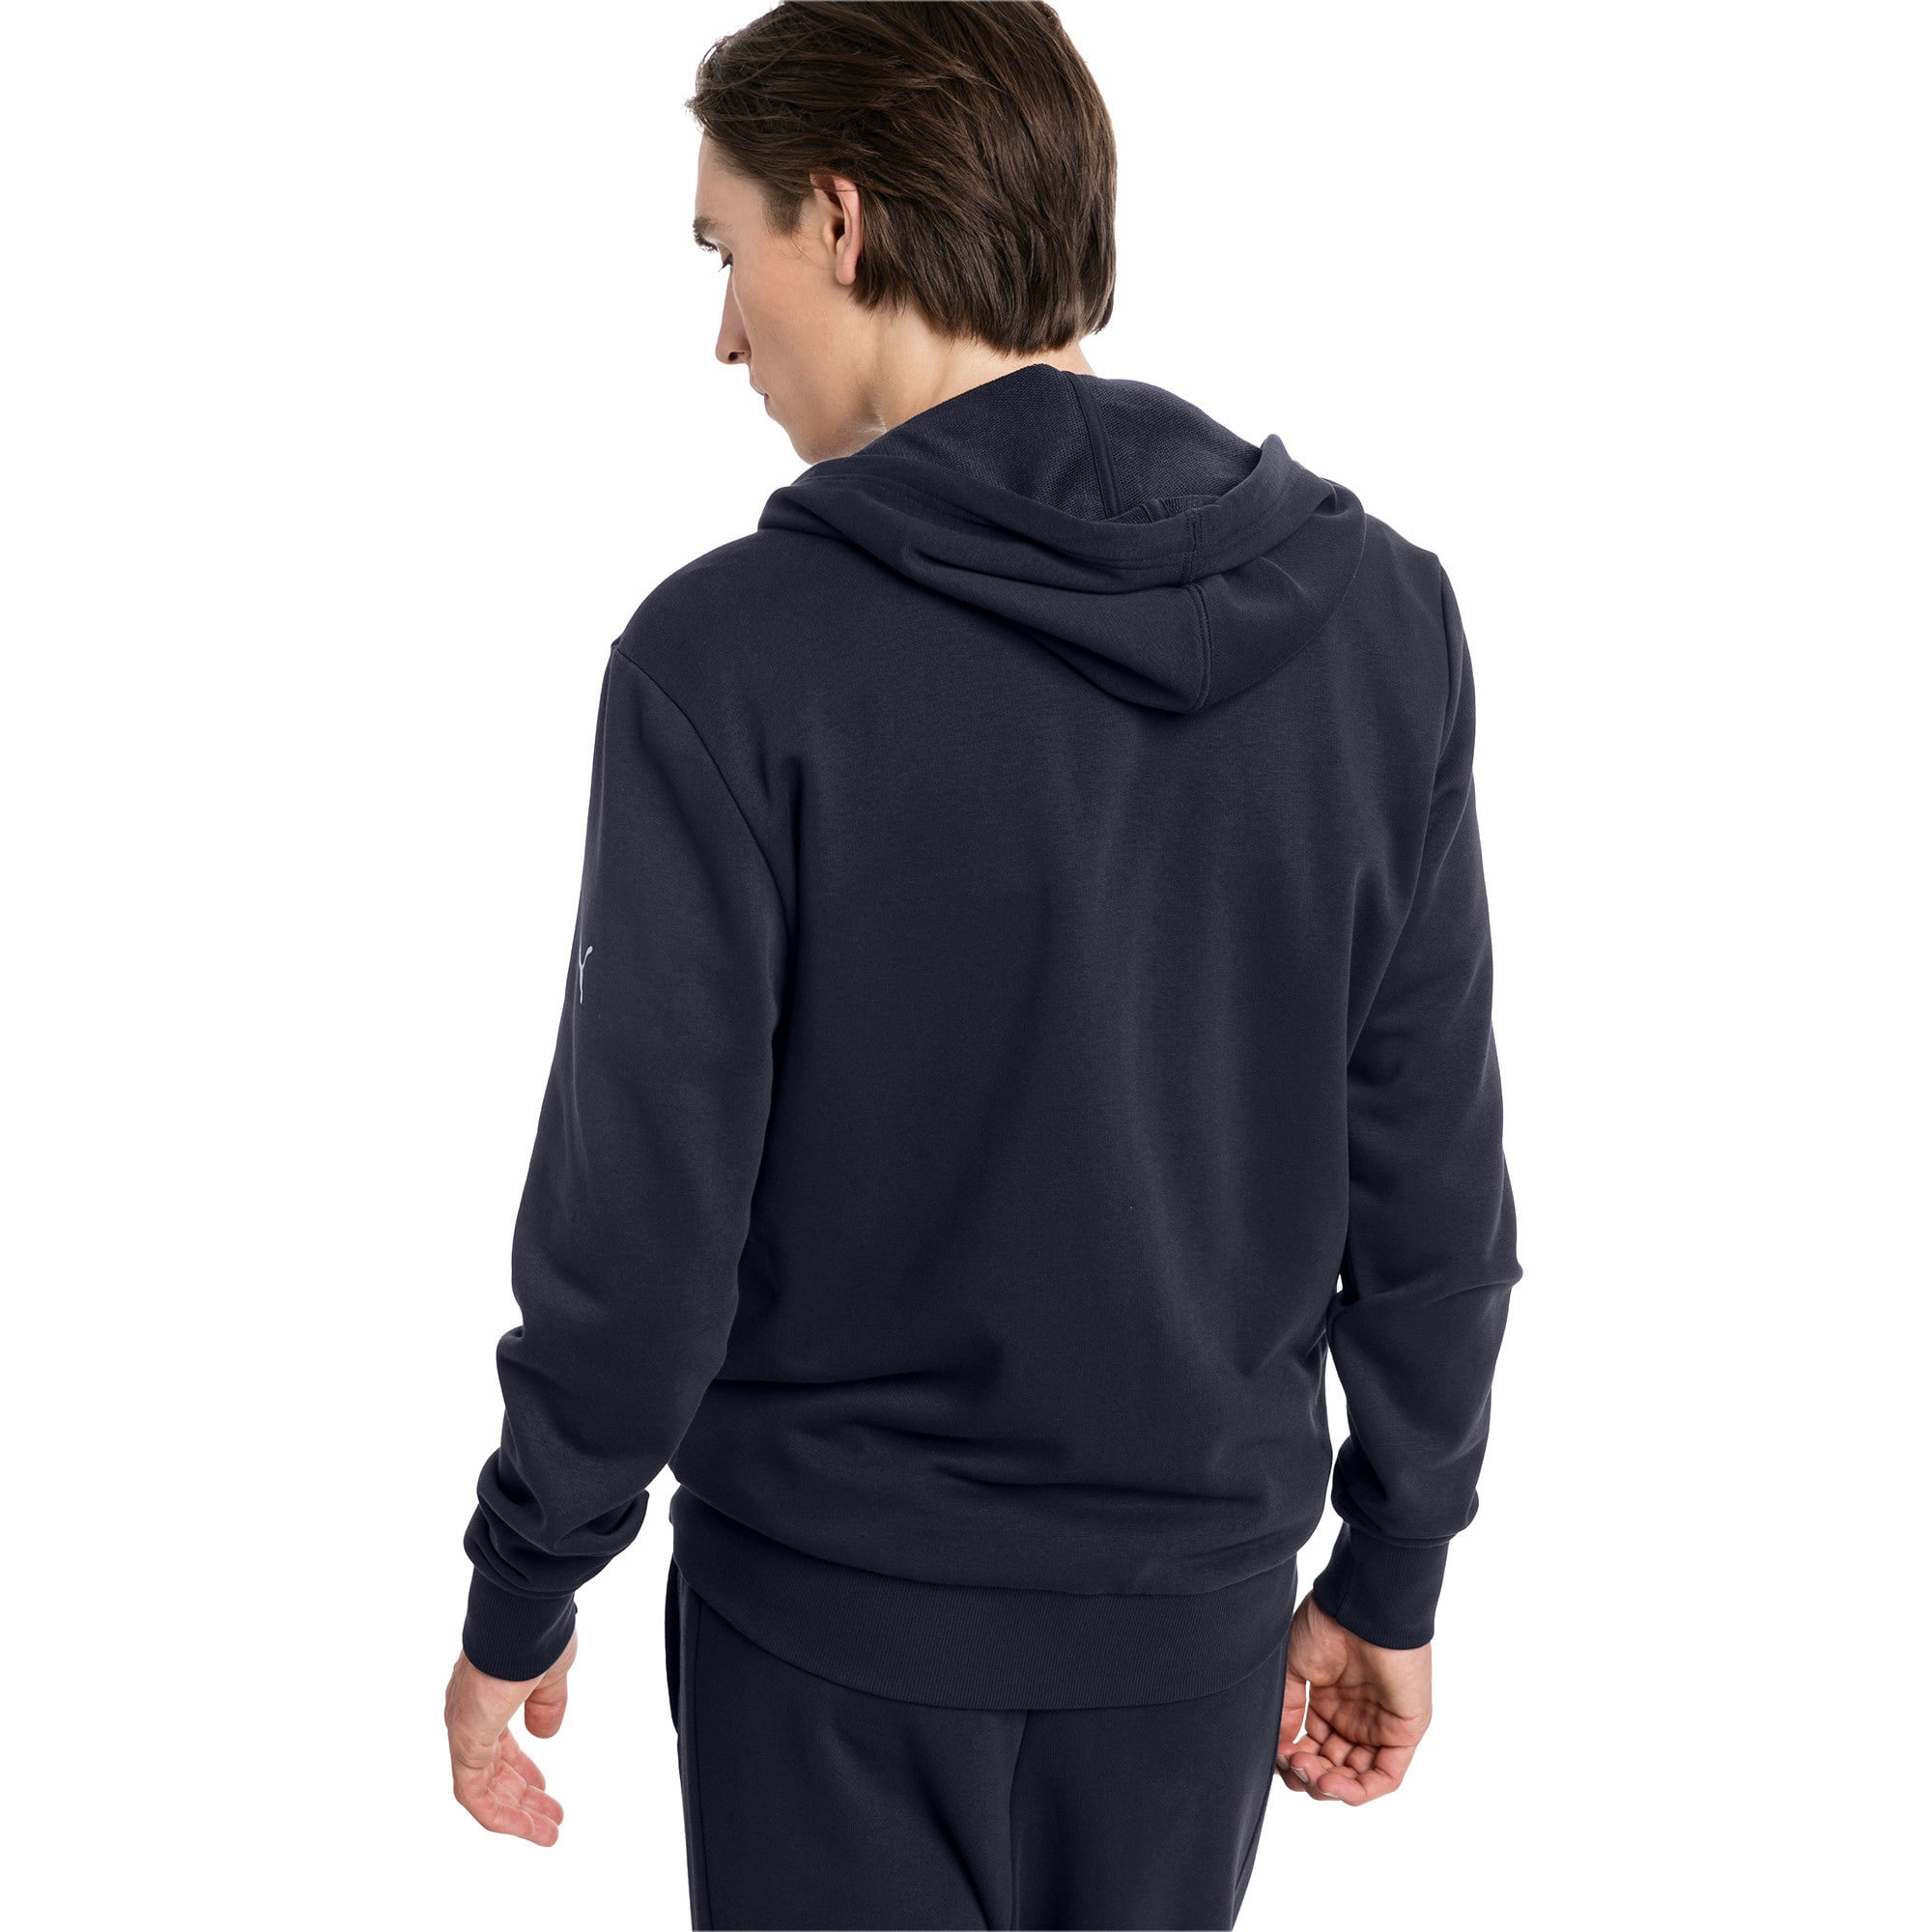 Thumbnail 2 of Red Bull Racing Logo Men's Hooded Sweat Jacket, NIGHT SKY, medium